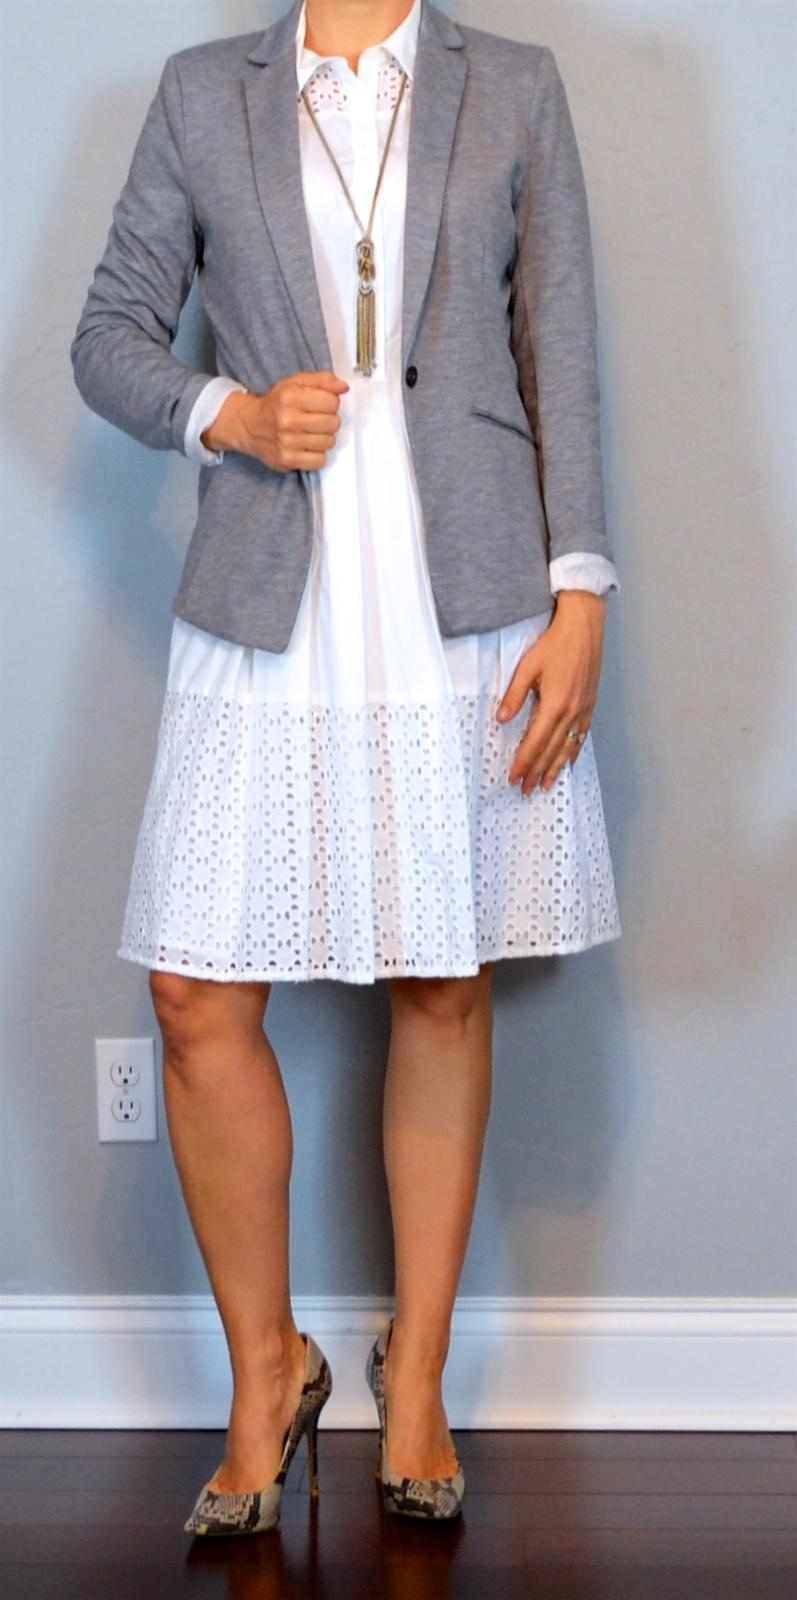 edbe729ef04 outfit post: white sleeveless eyelet shirtdress, grey jersey blazer,  pointed toe snakeskin pump